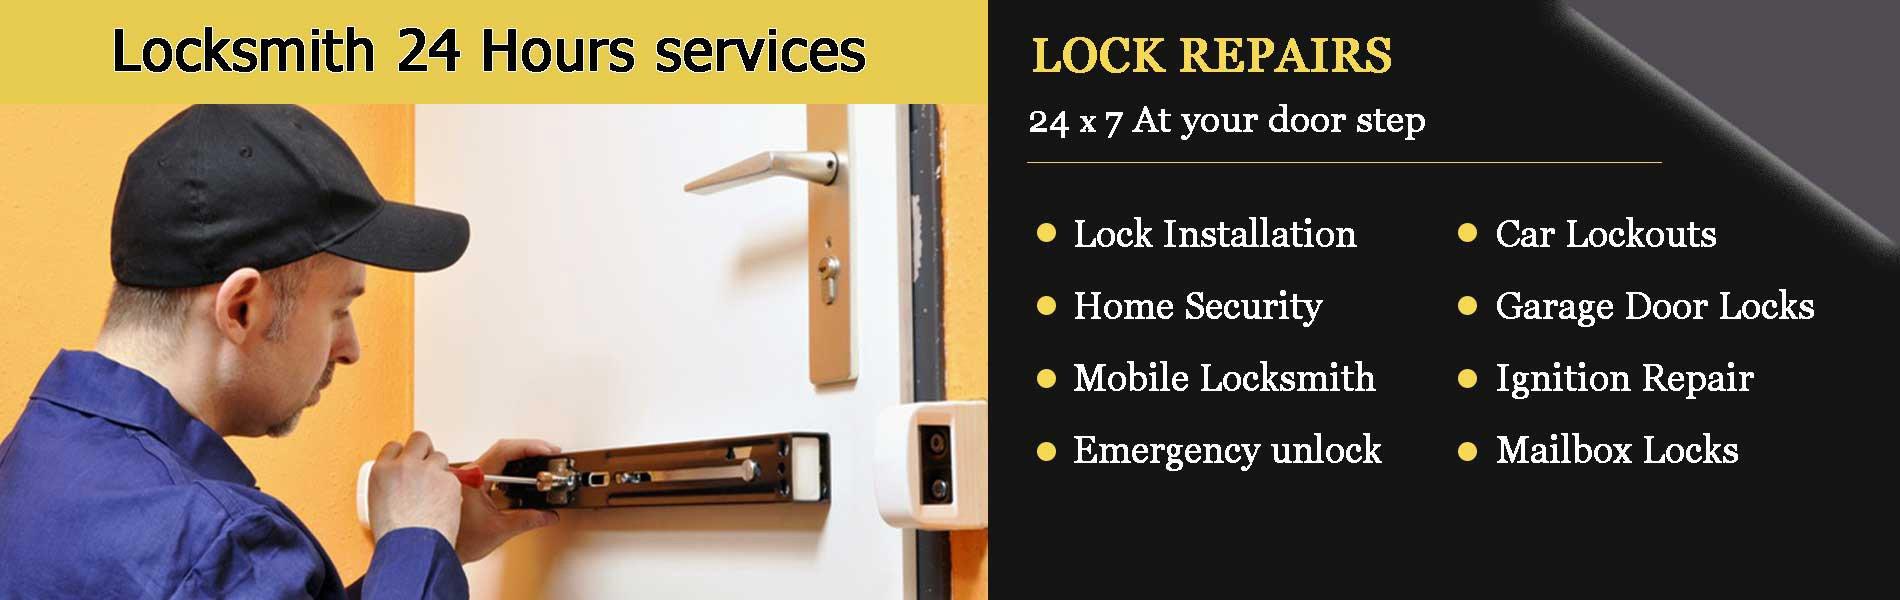 Garage door repair delray beach - City Locksmith Store Delray Beach Fl 561 692 4683